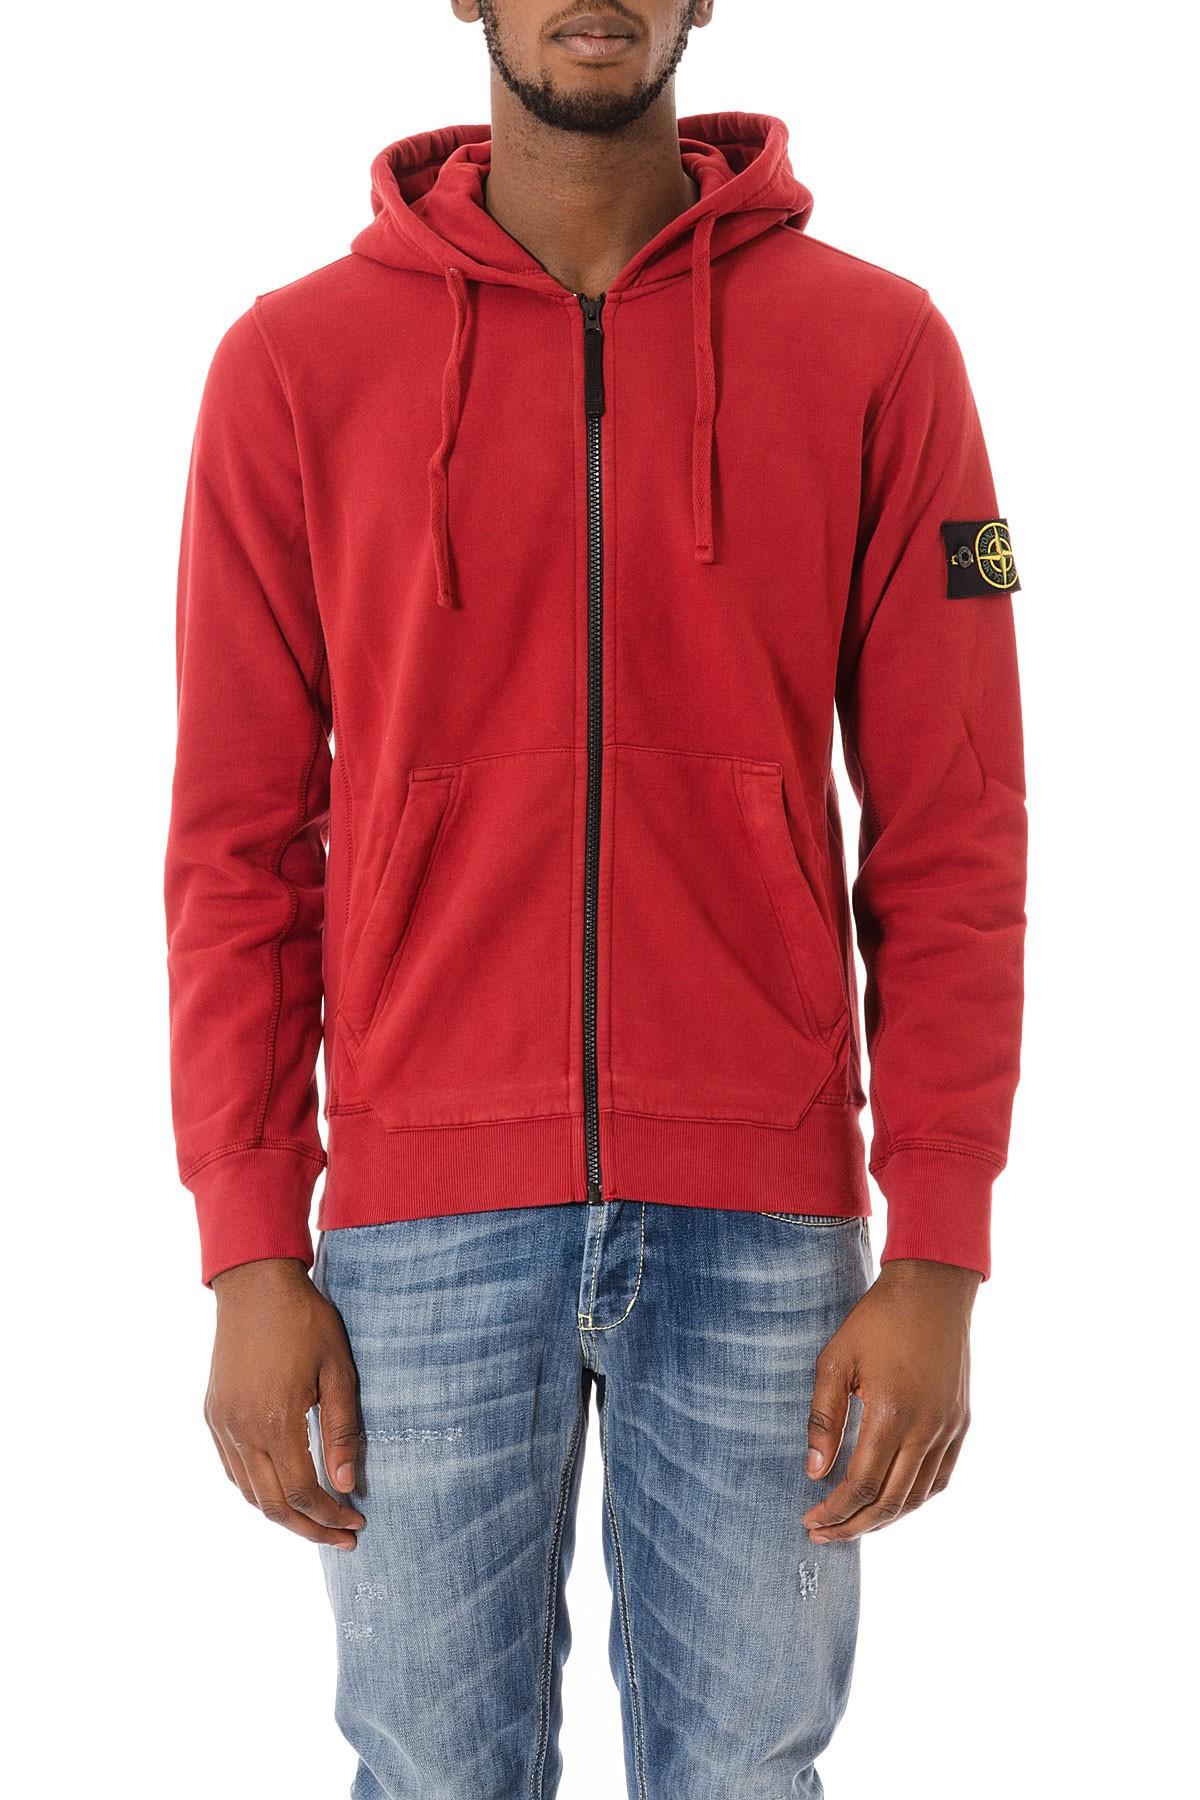 pretty nice 53f51 c3cb2 STONE ISLAND Red sweatshirt for man F/W 15-16